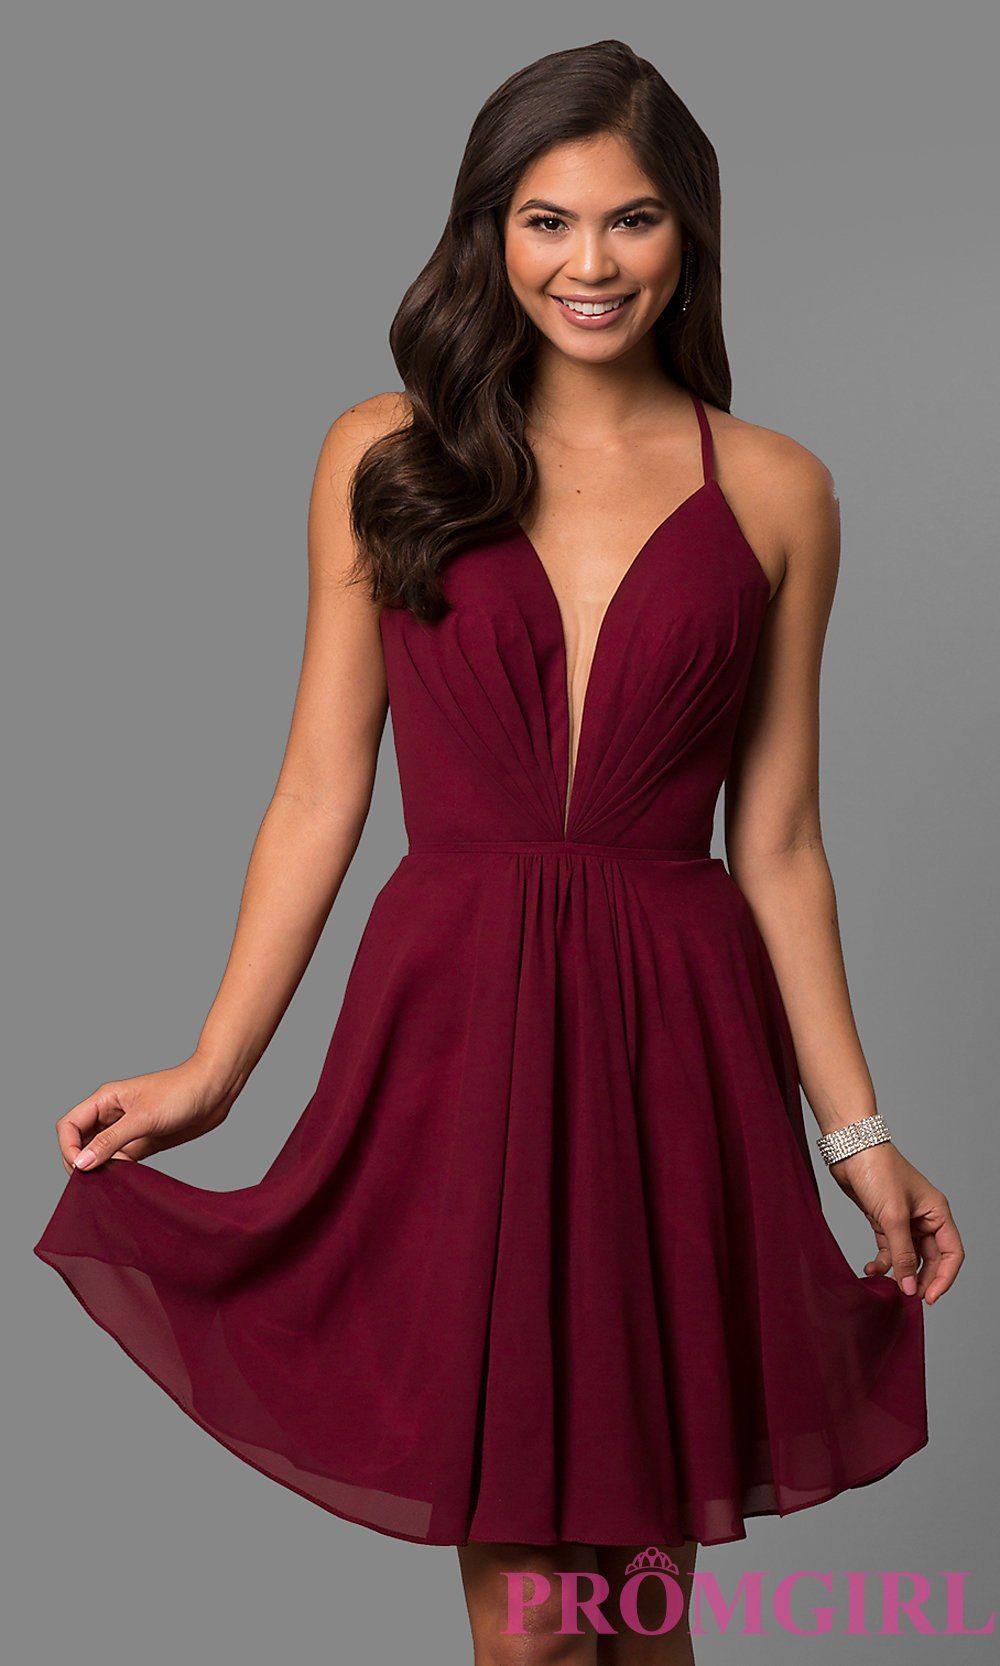 ff9a6c63e81 Short Homecoming Dresses Promgirl